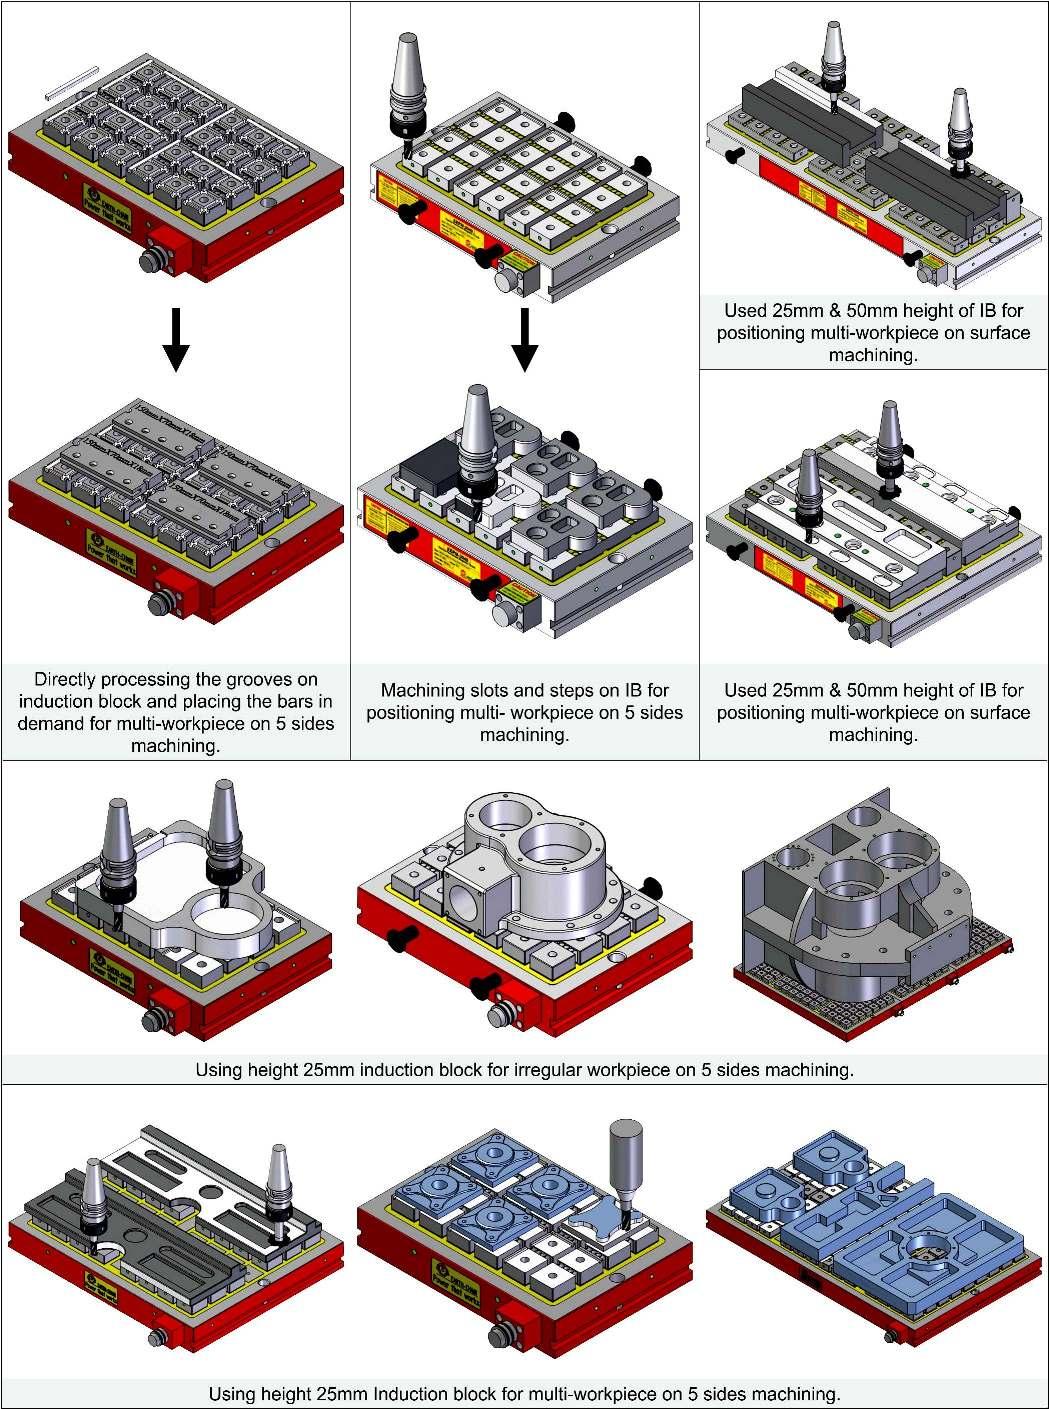 proimages/products/product-01/EEPM/EEPM-A/IB05.jpg